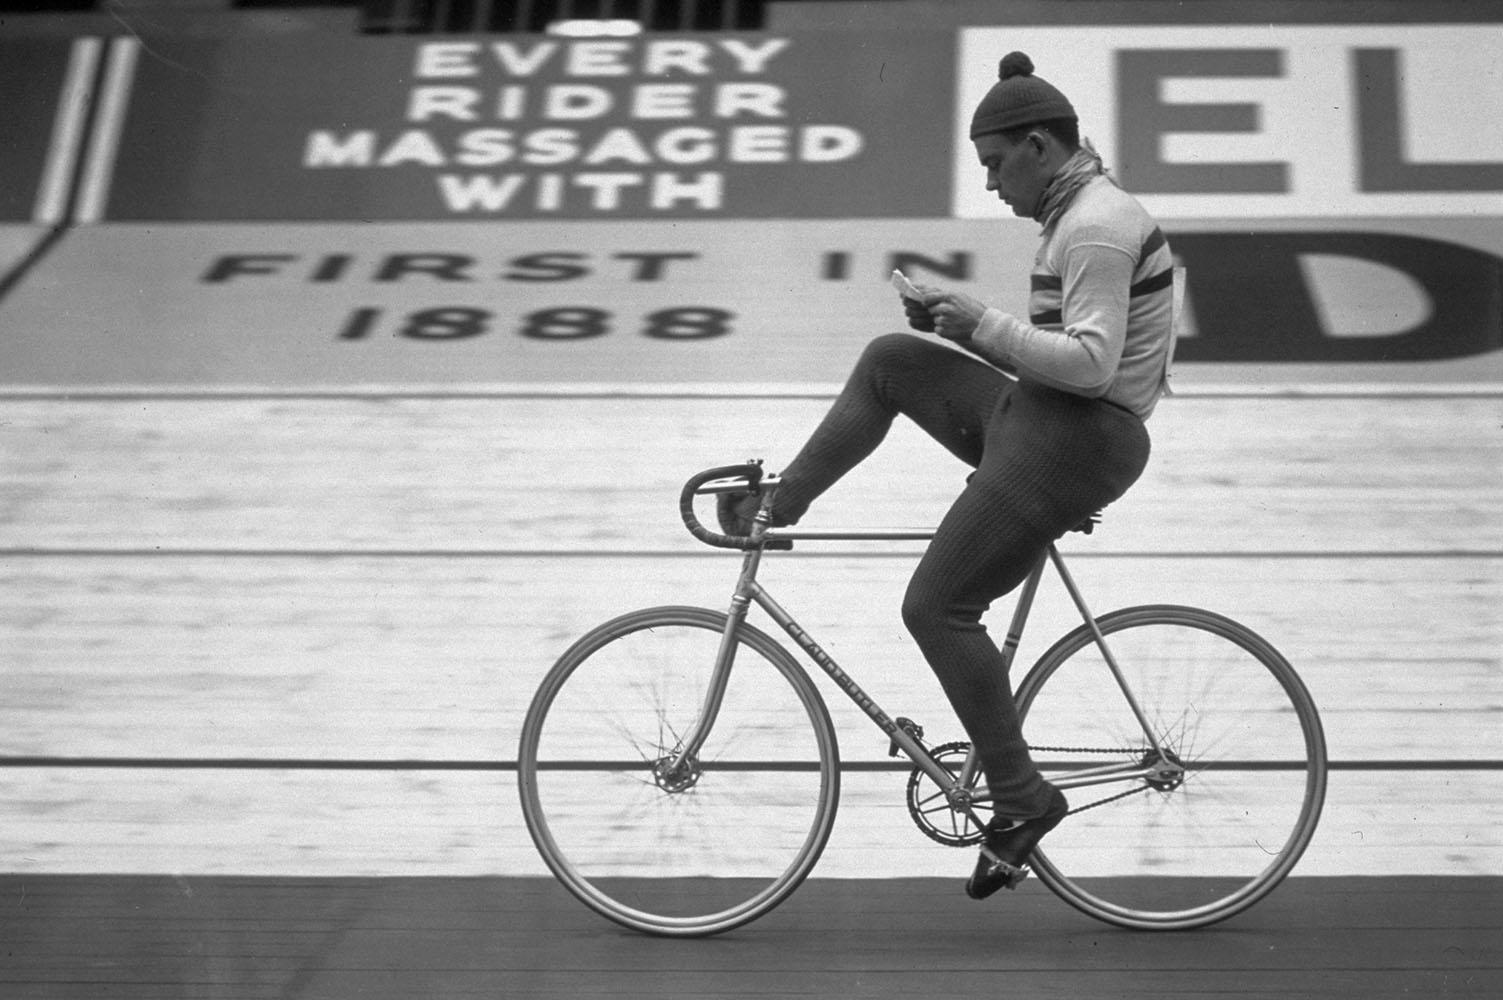 Easy Rider fine art photography